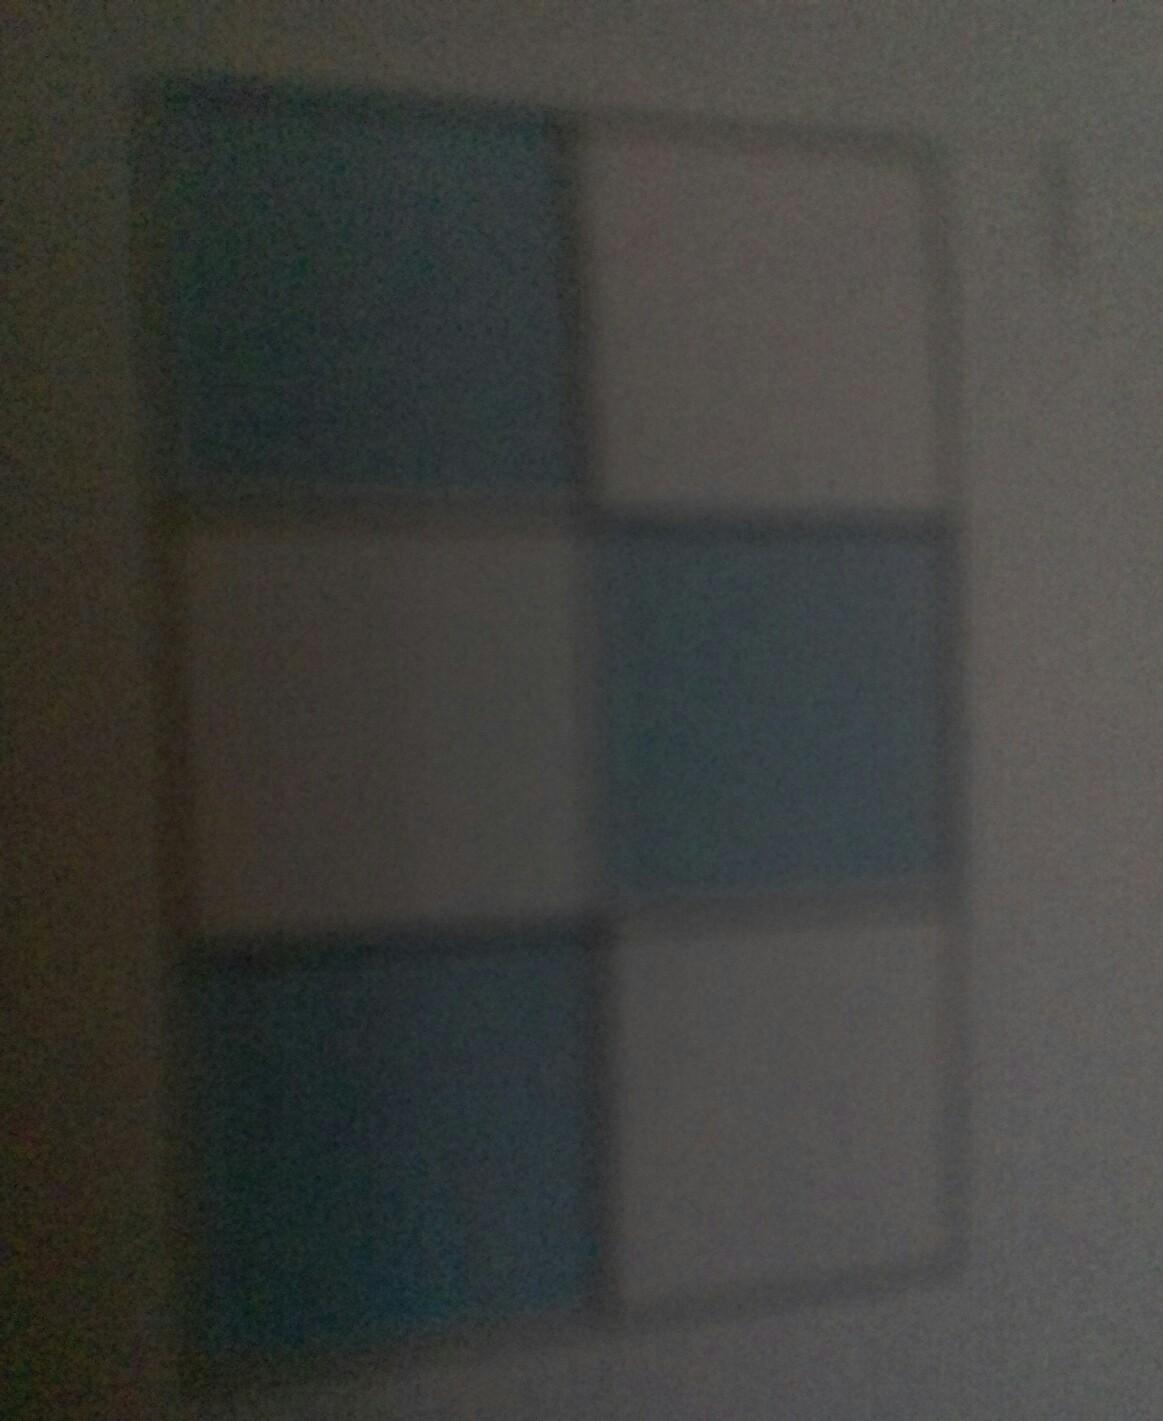 87+ Gambar Arsiran Pecahan 1/3 Paling Hist